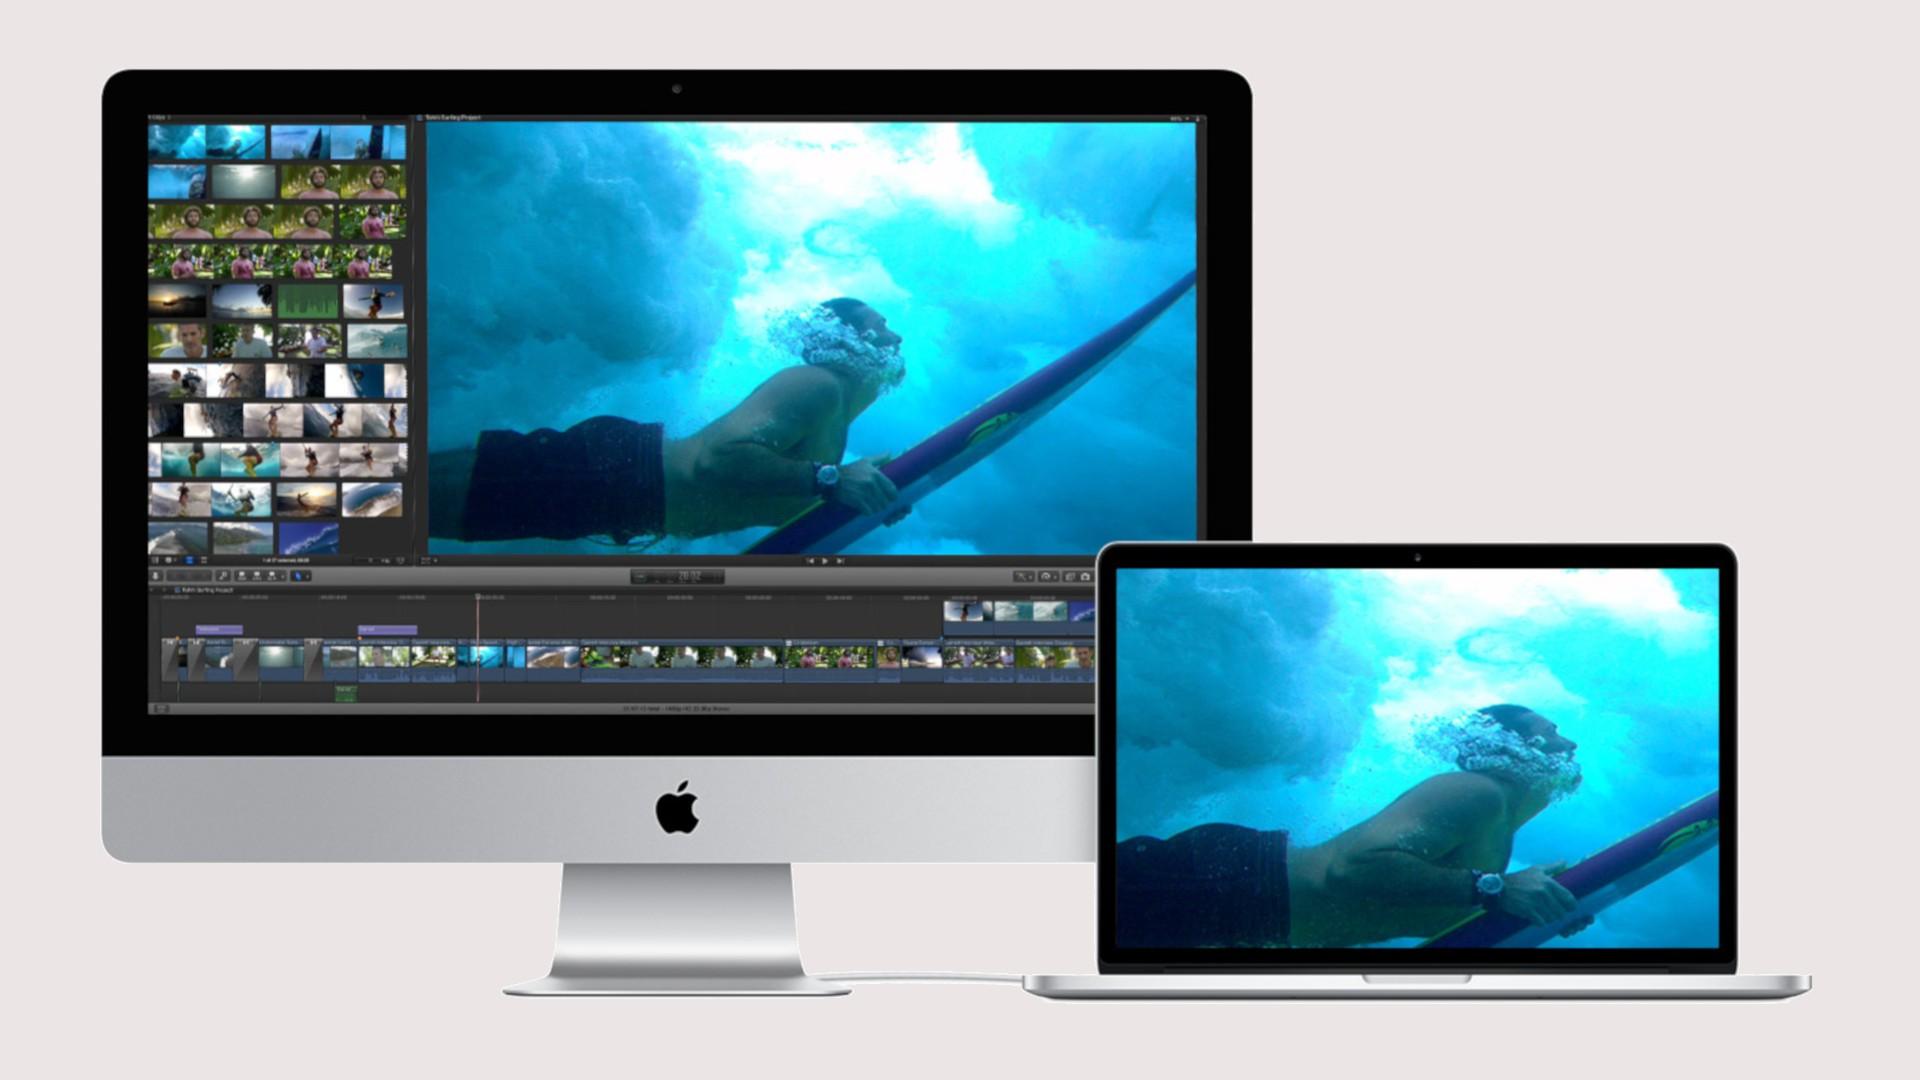 Apple подняла цены на iMac, MacBook и Mac Pro